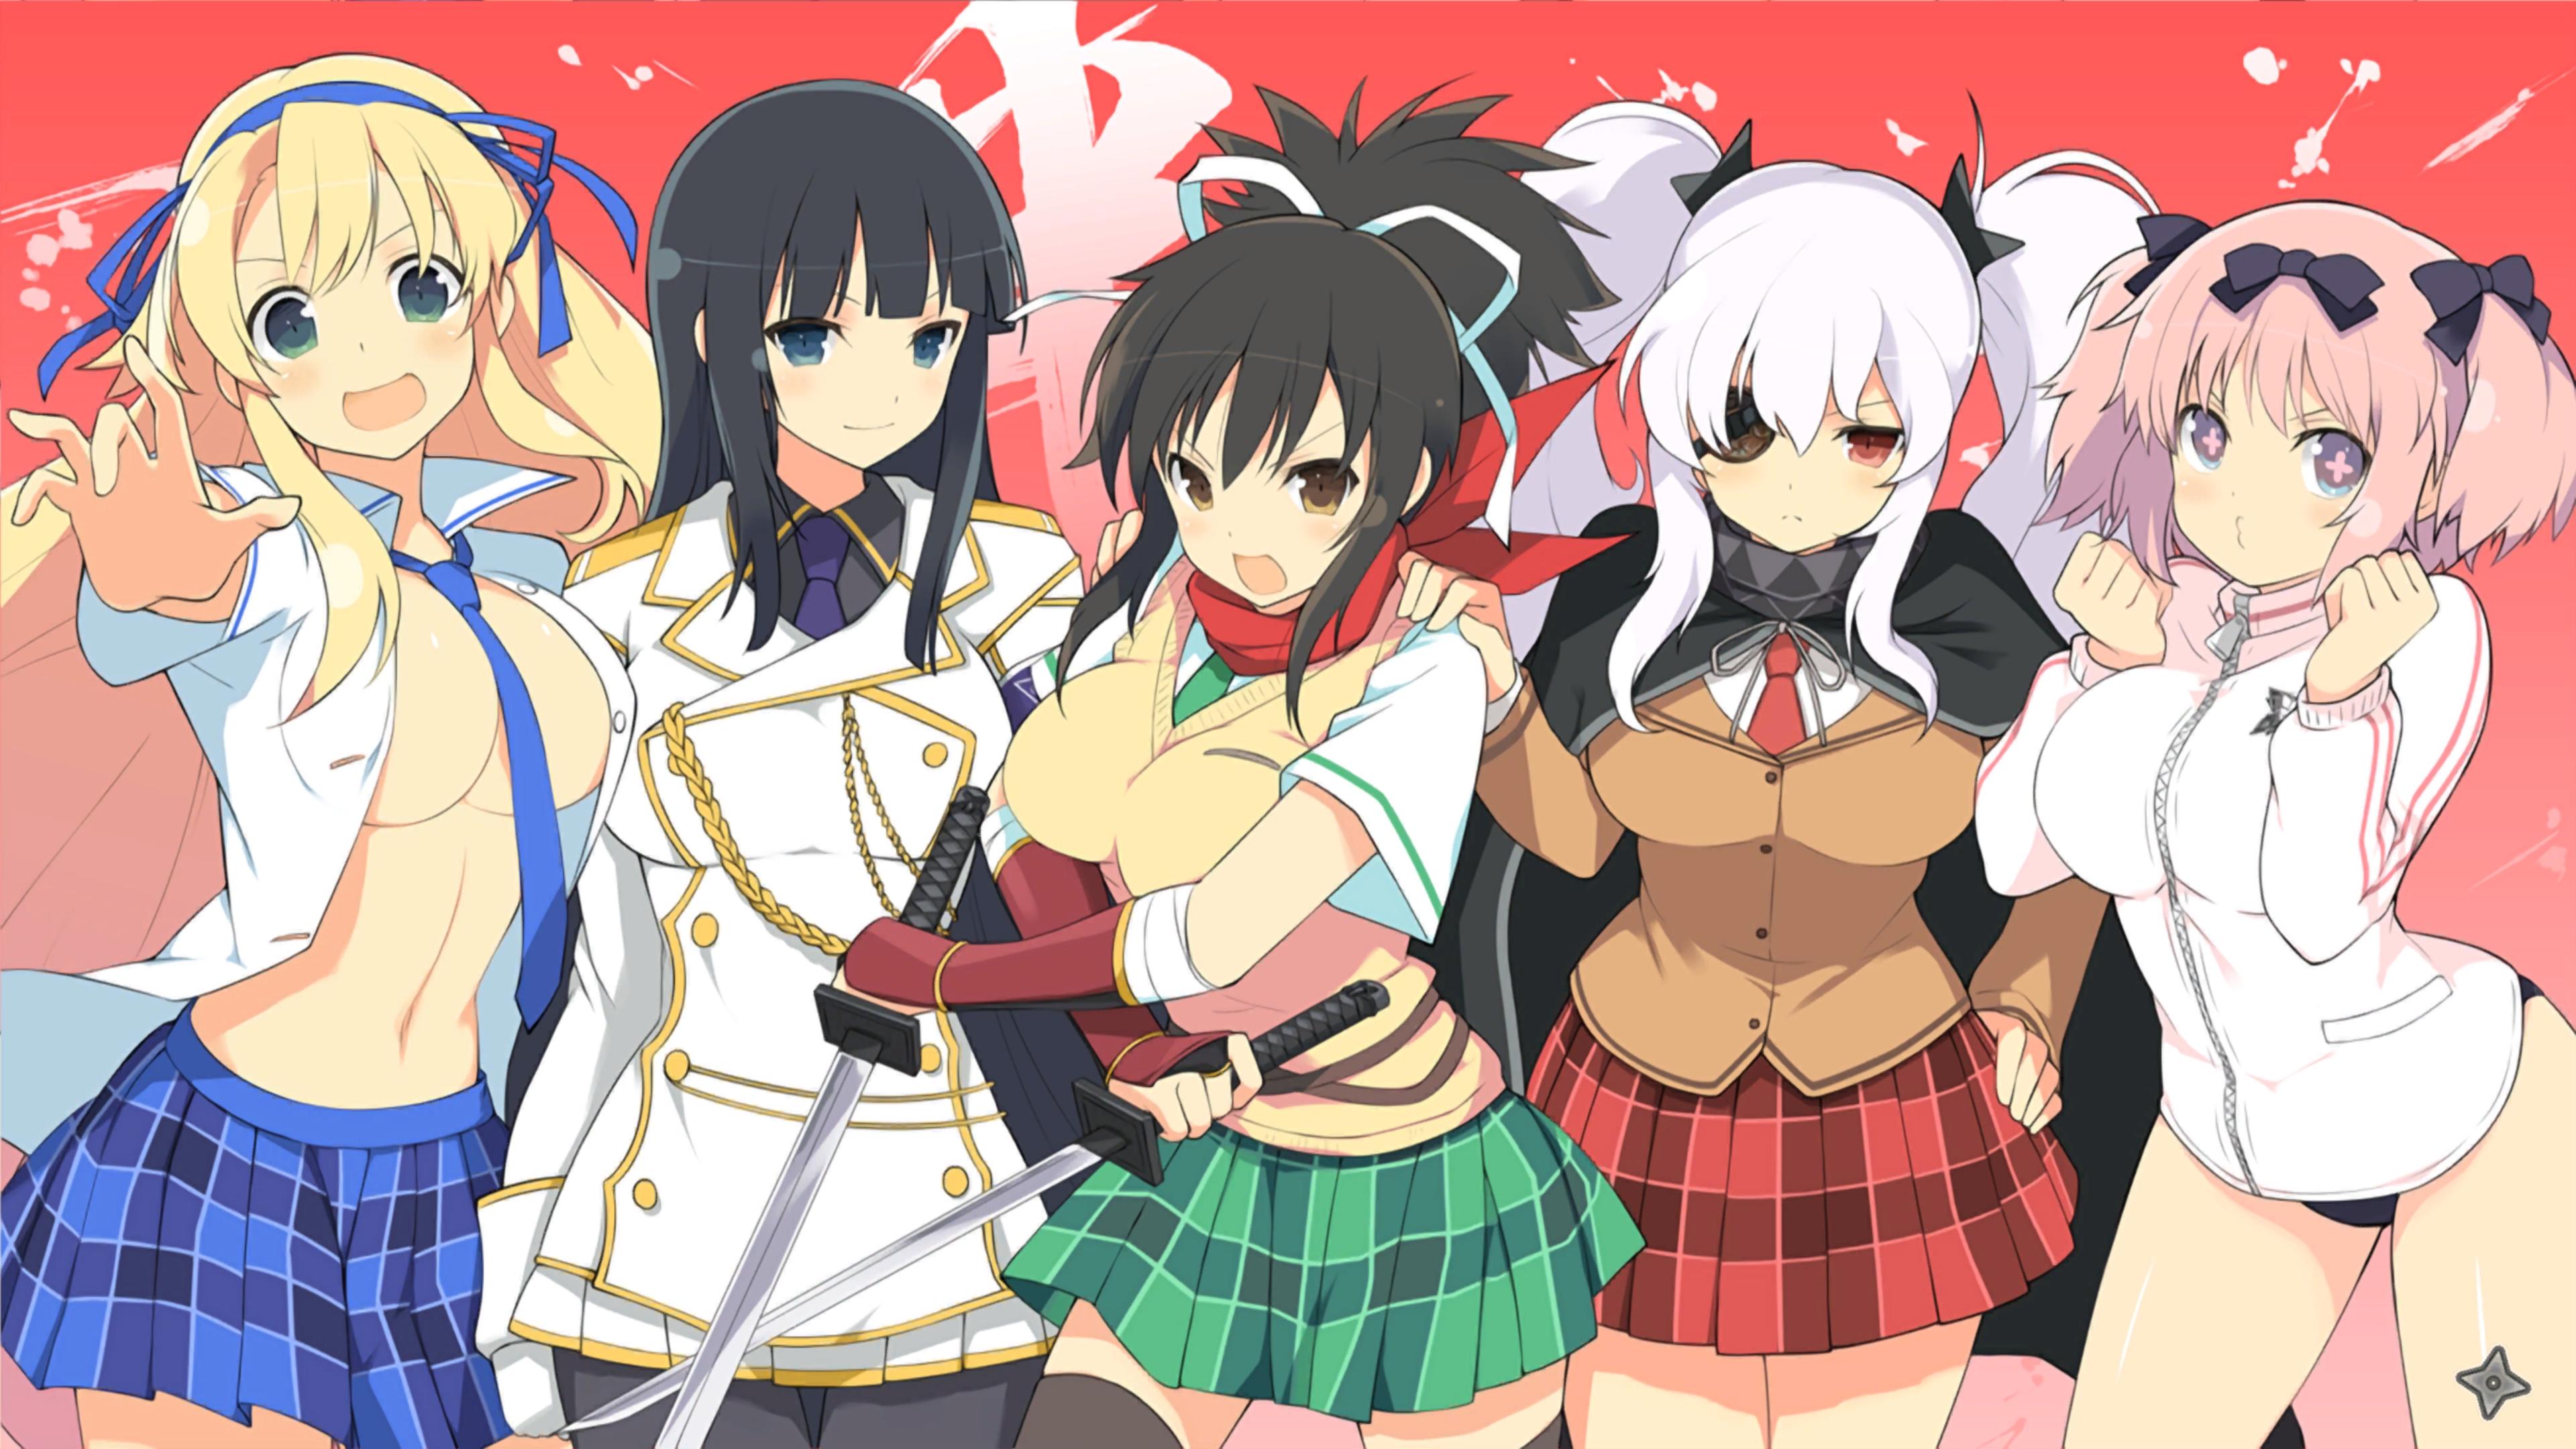 Senran Kagura Shinovi Versus Hanzo Academy 4k By User619 On Deviantart